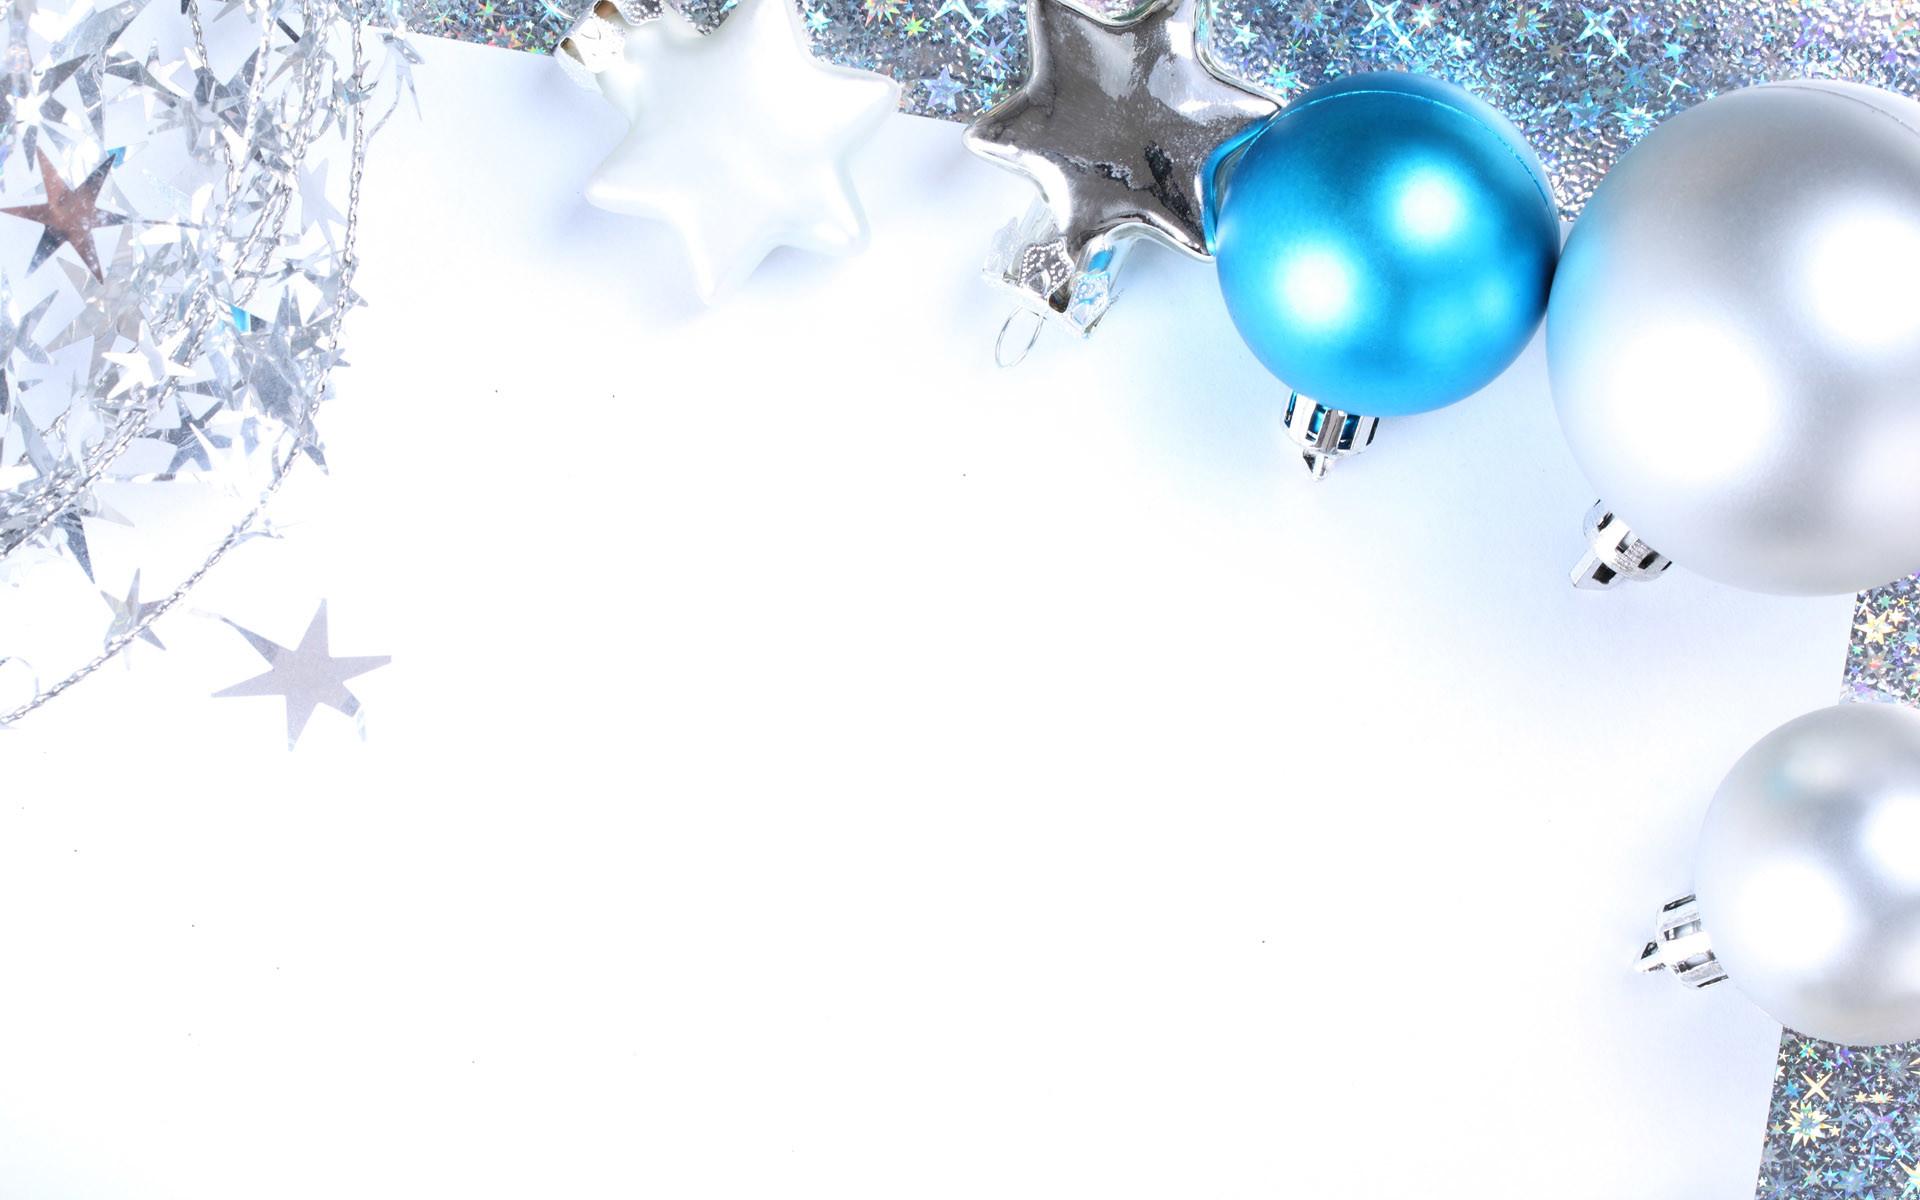 White Christmas Wallpaper (74+ images)